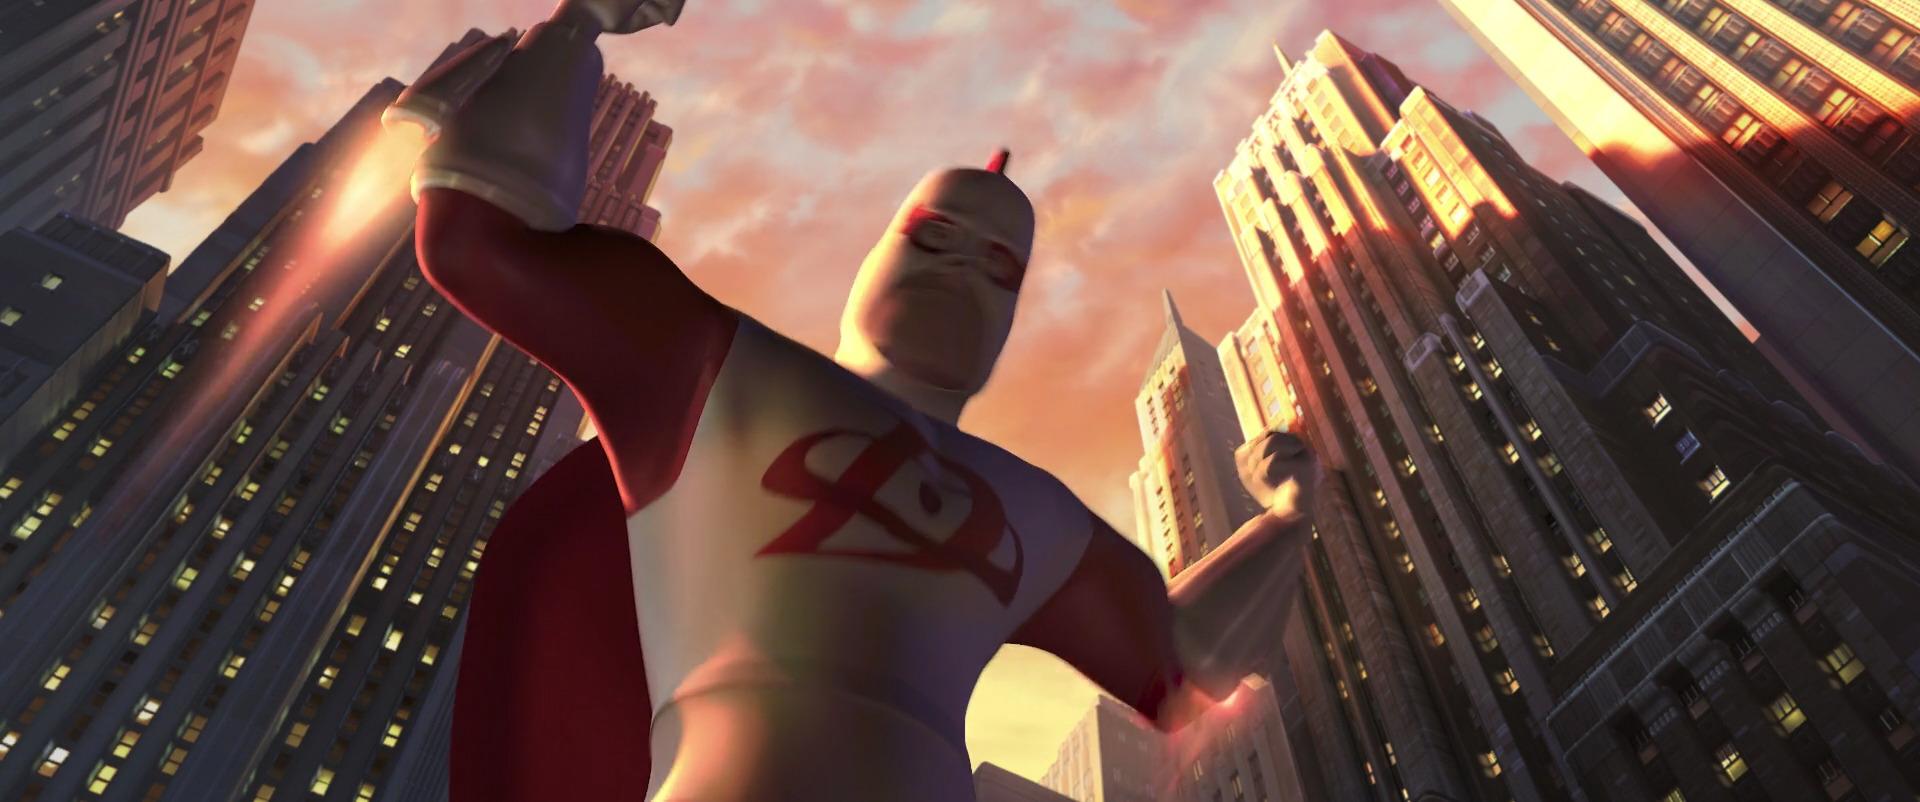 ultraman dynaman pixar disney personnage character indestructibles incredibles